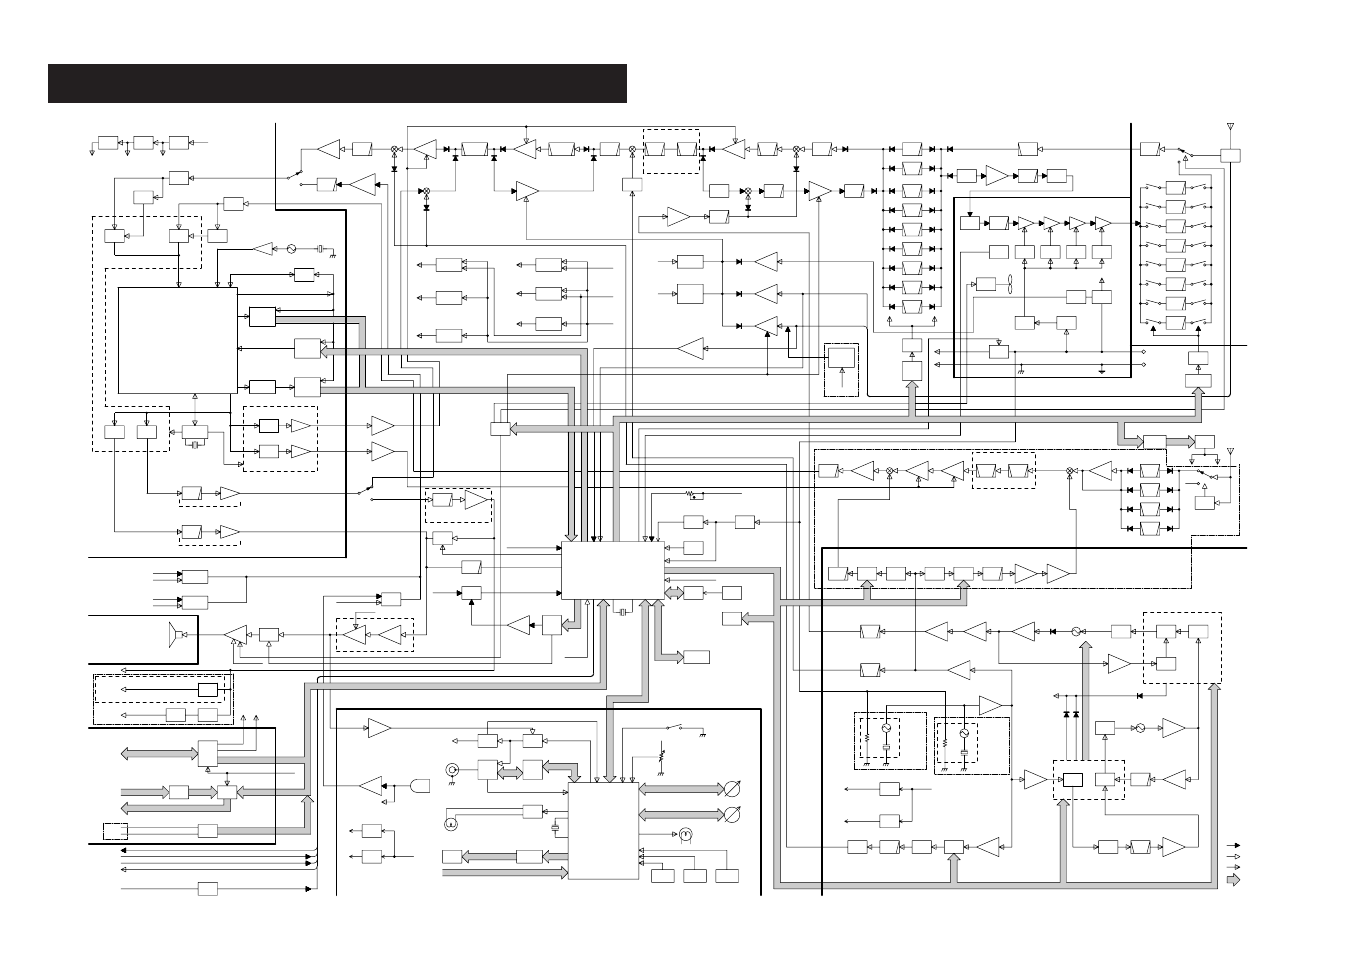 66 Block Schematic